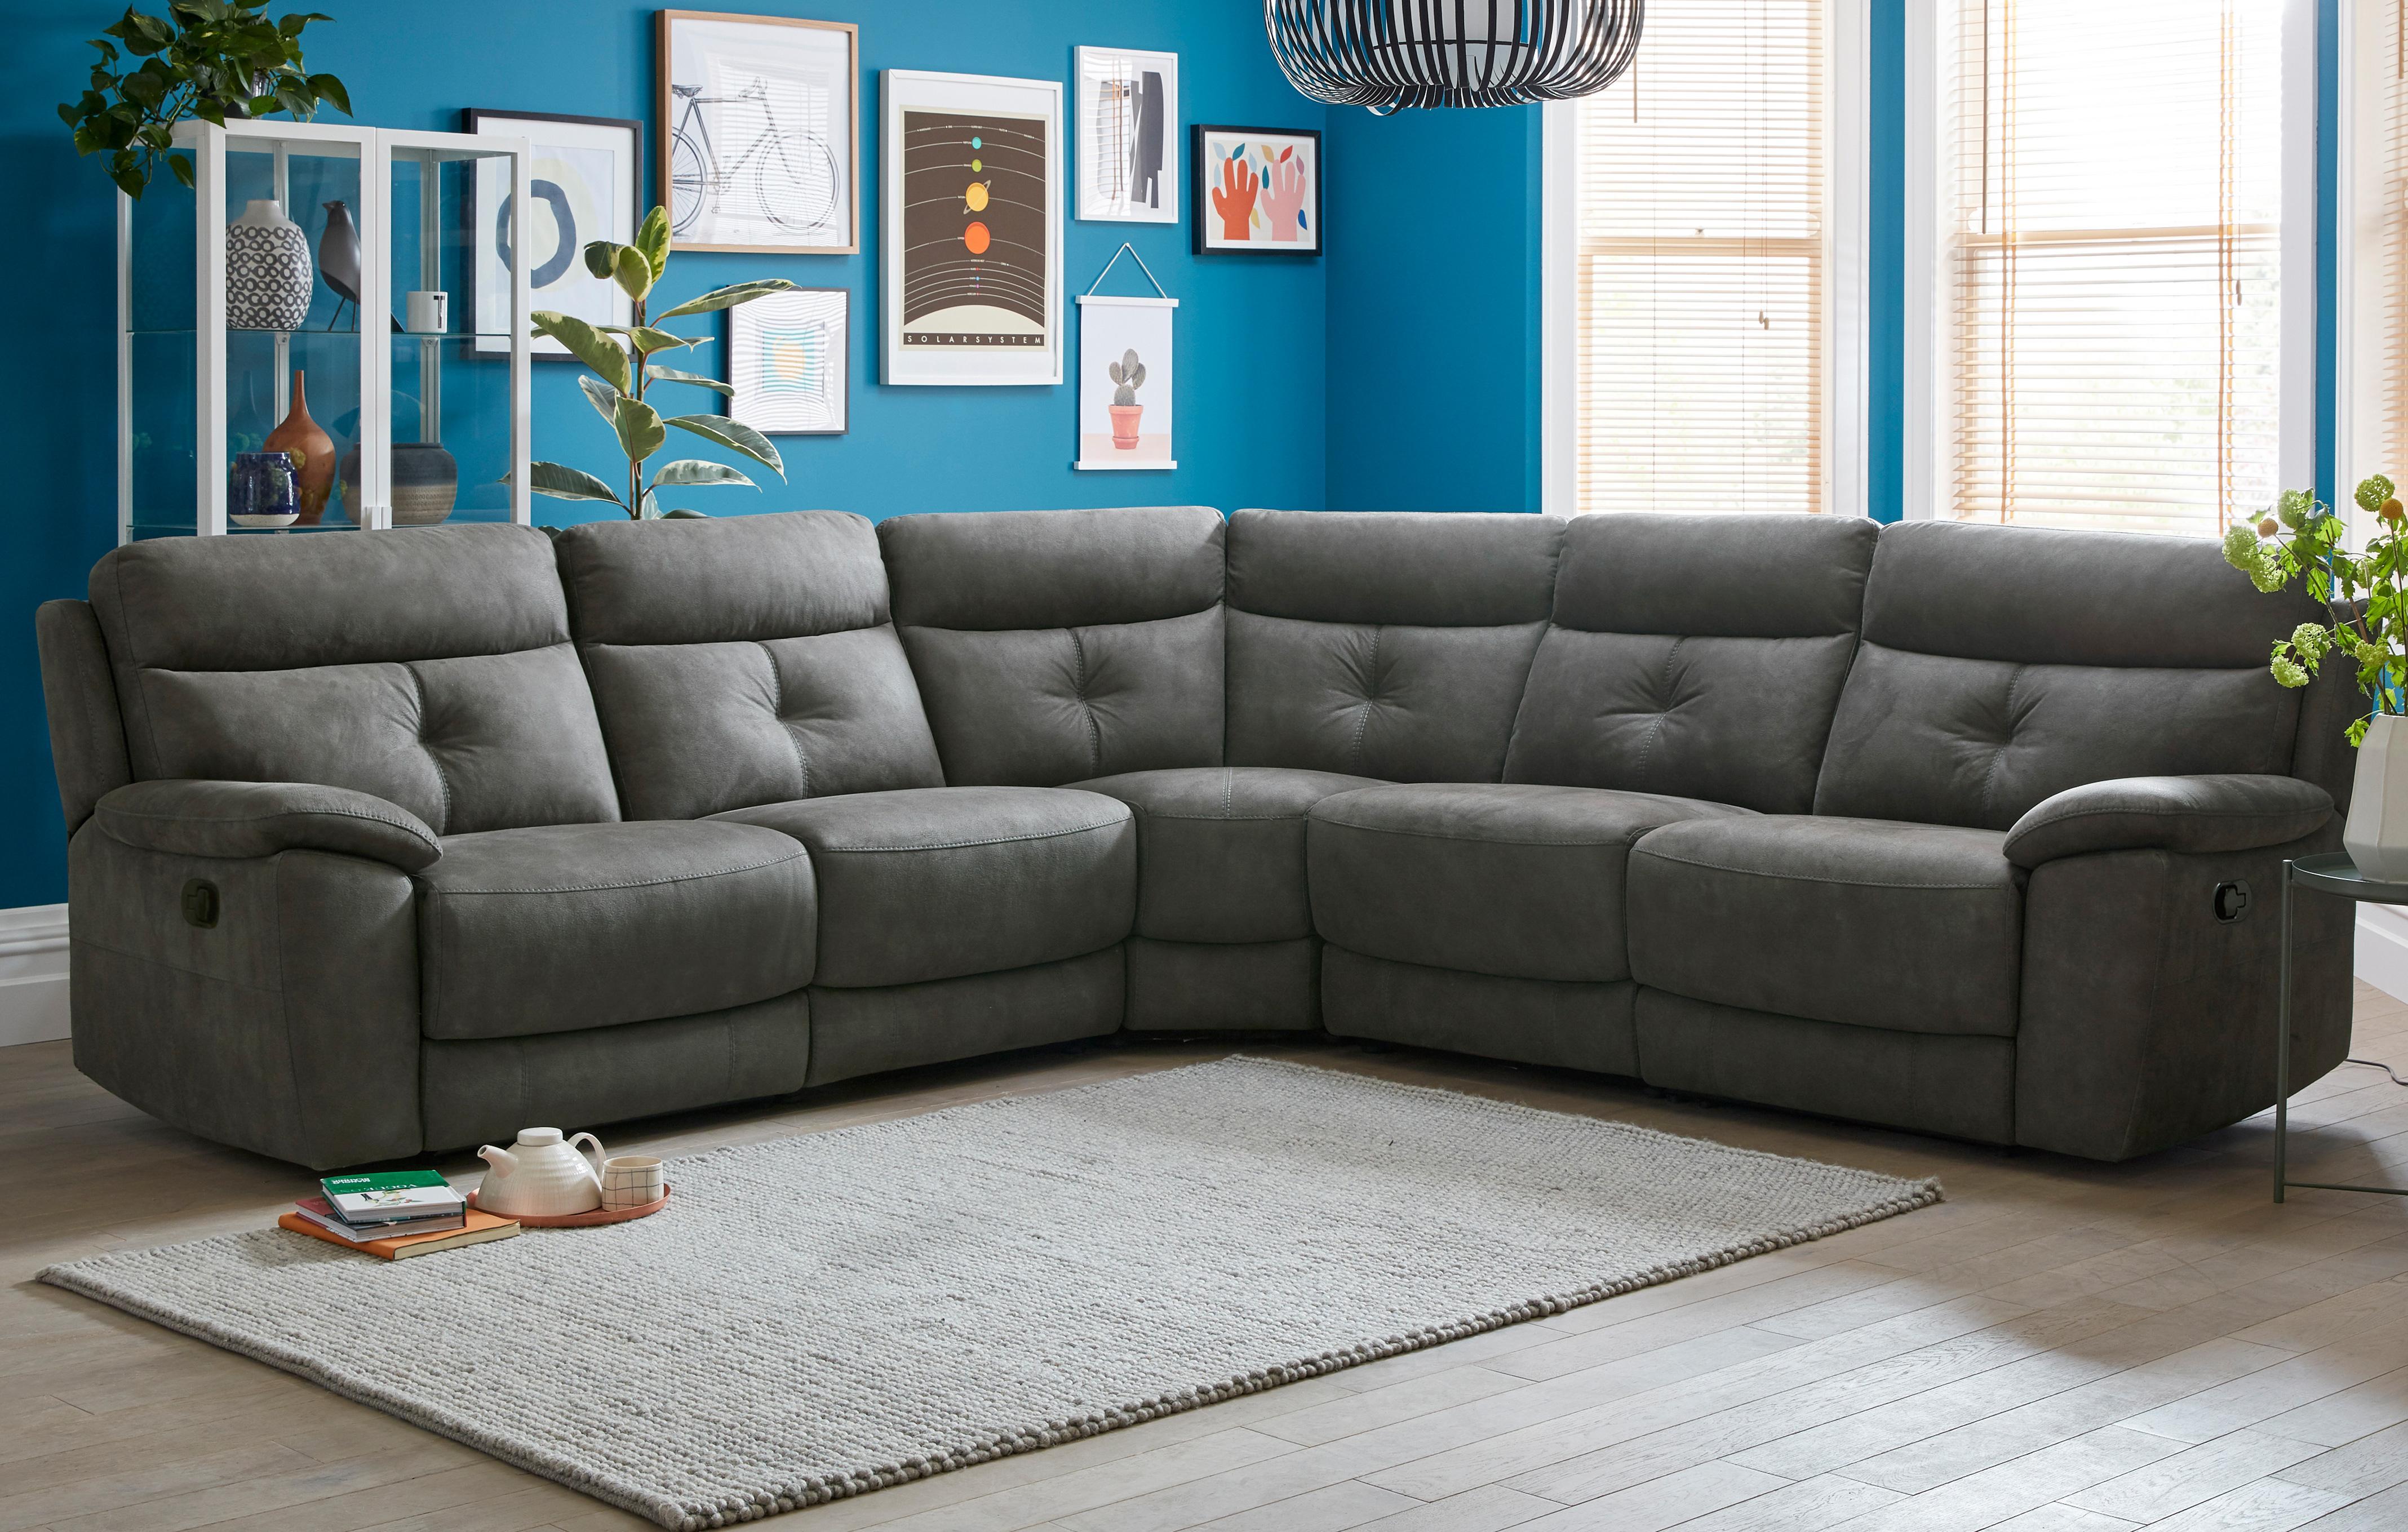 Wondrous Fabric Sofa Sales And Deals Across The Full Range Dfs Atara Machost Co Dining Chair Design Ideas Machostcouk